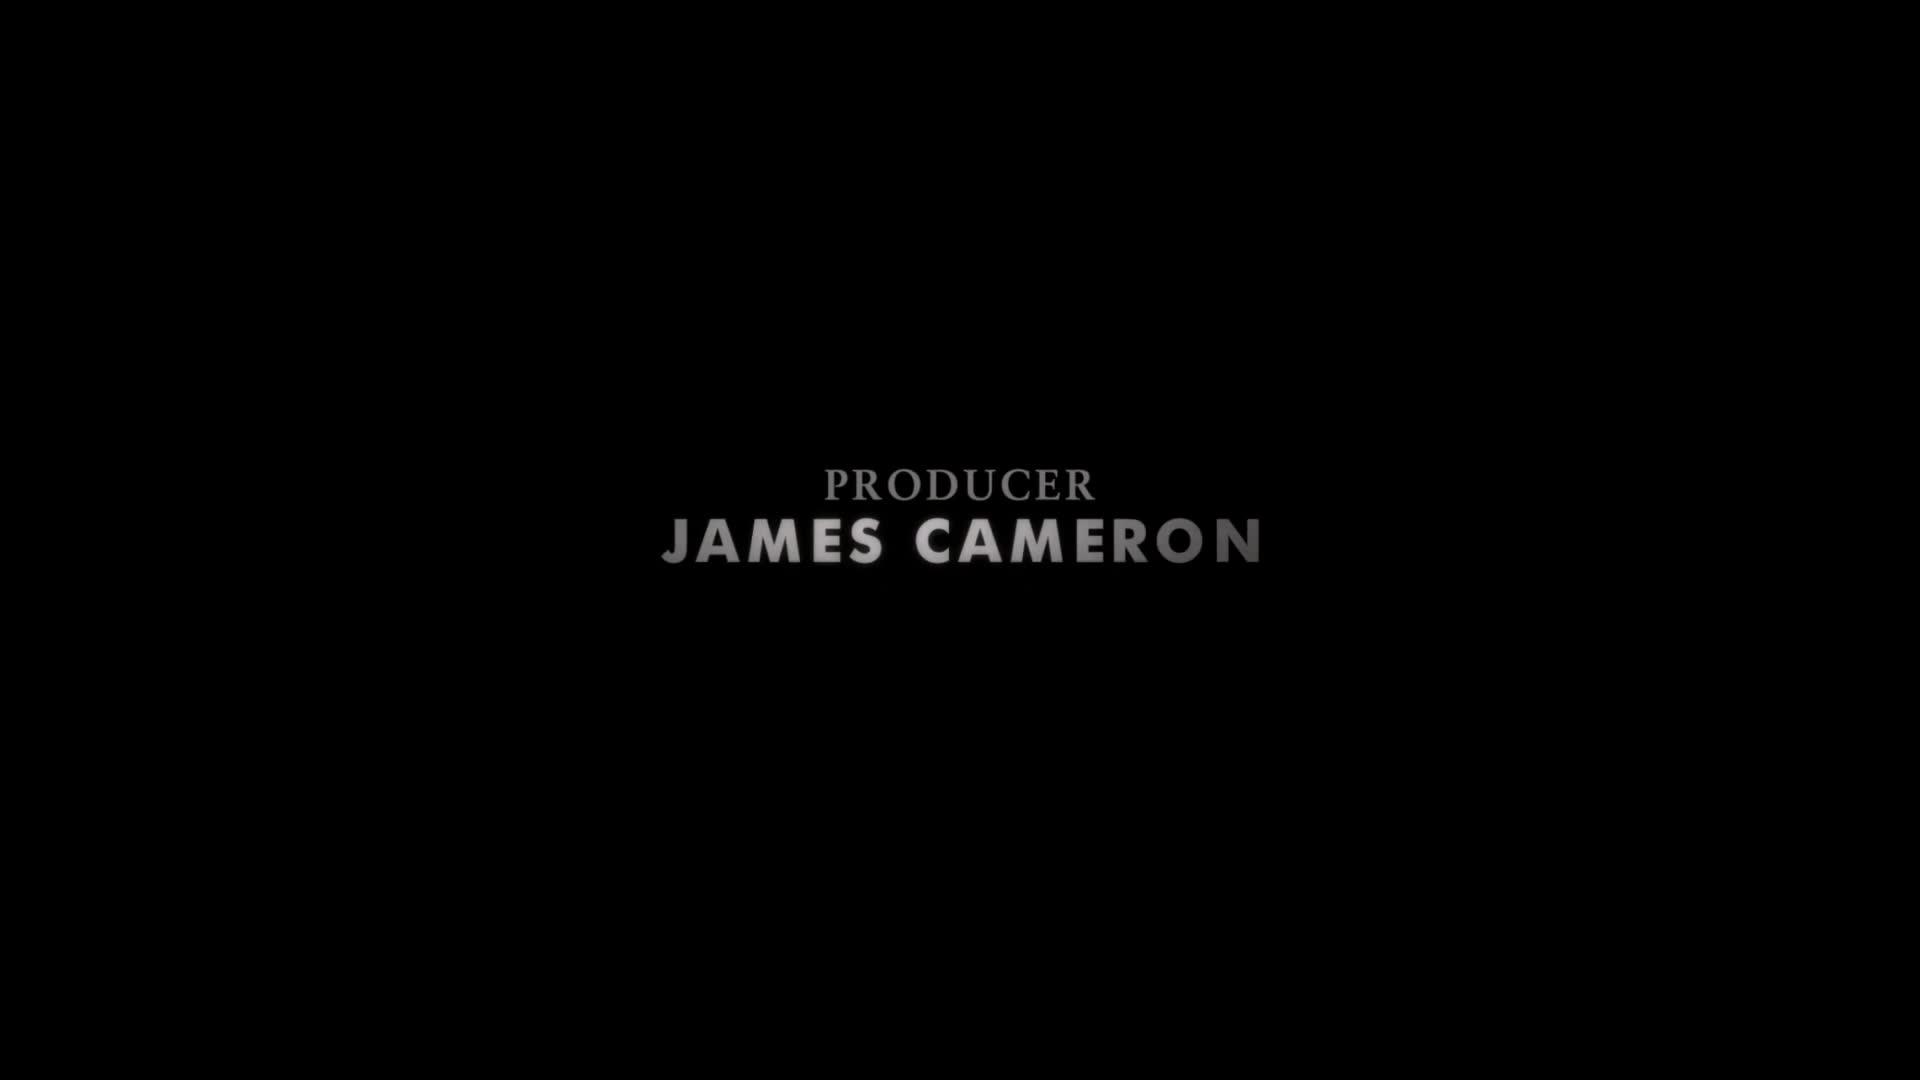 Terminator: Dark Fate - International Trailer #1 [HD] screen capture